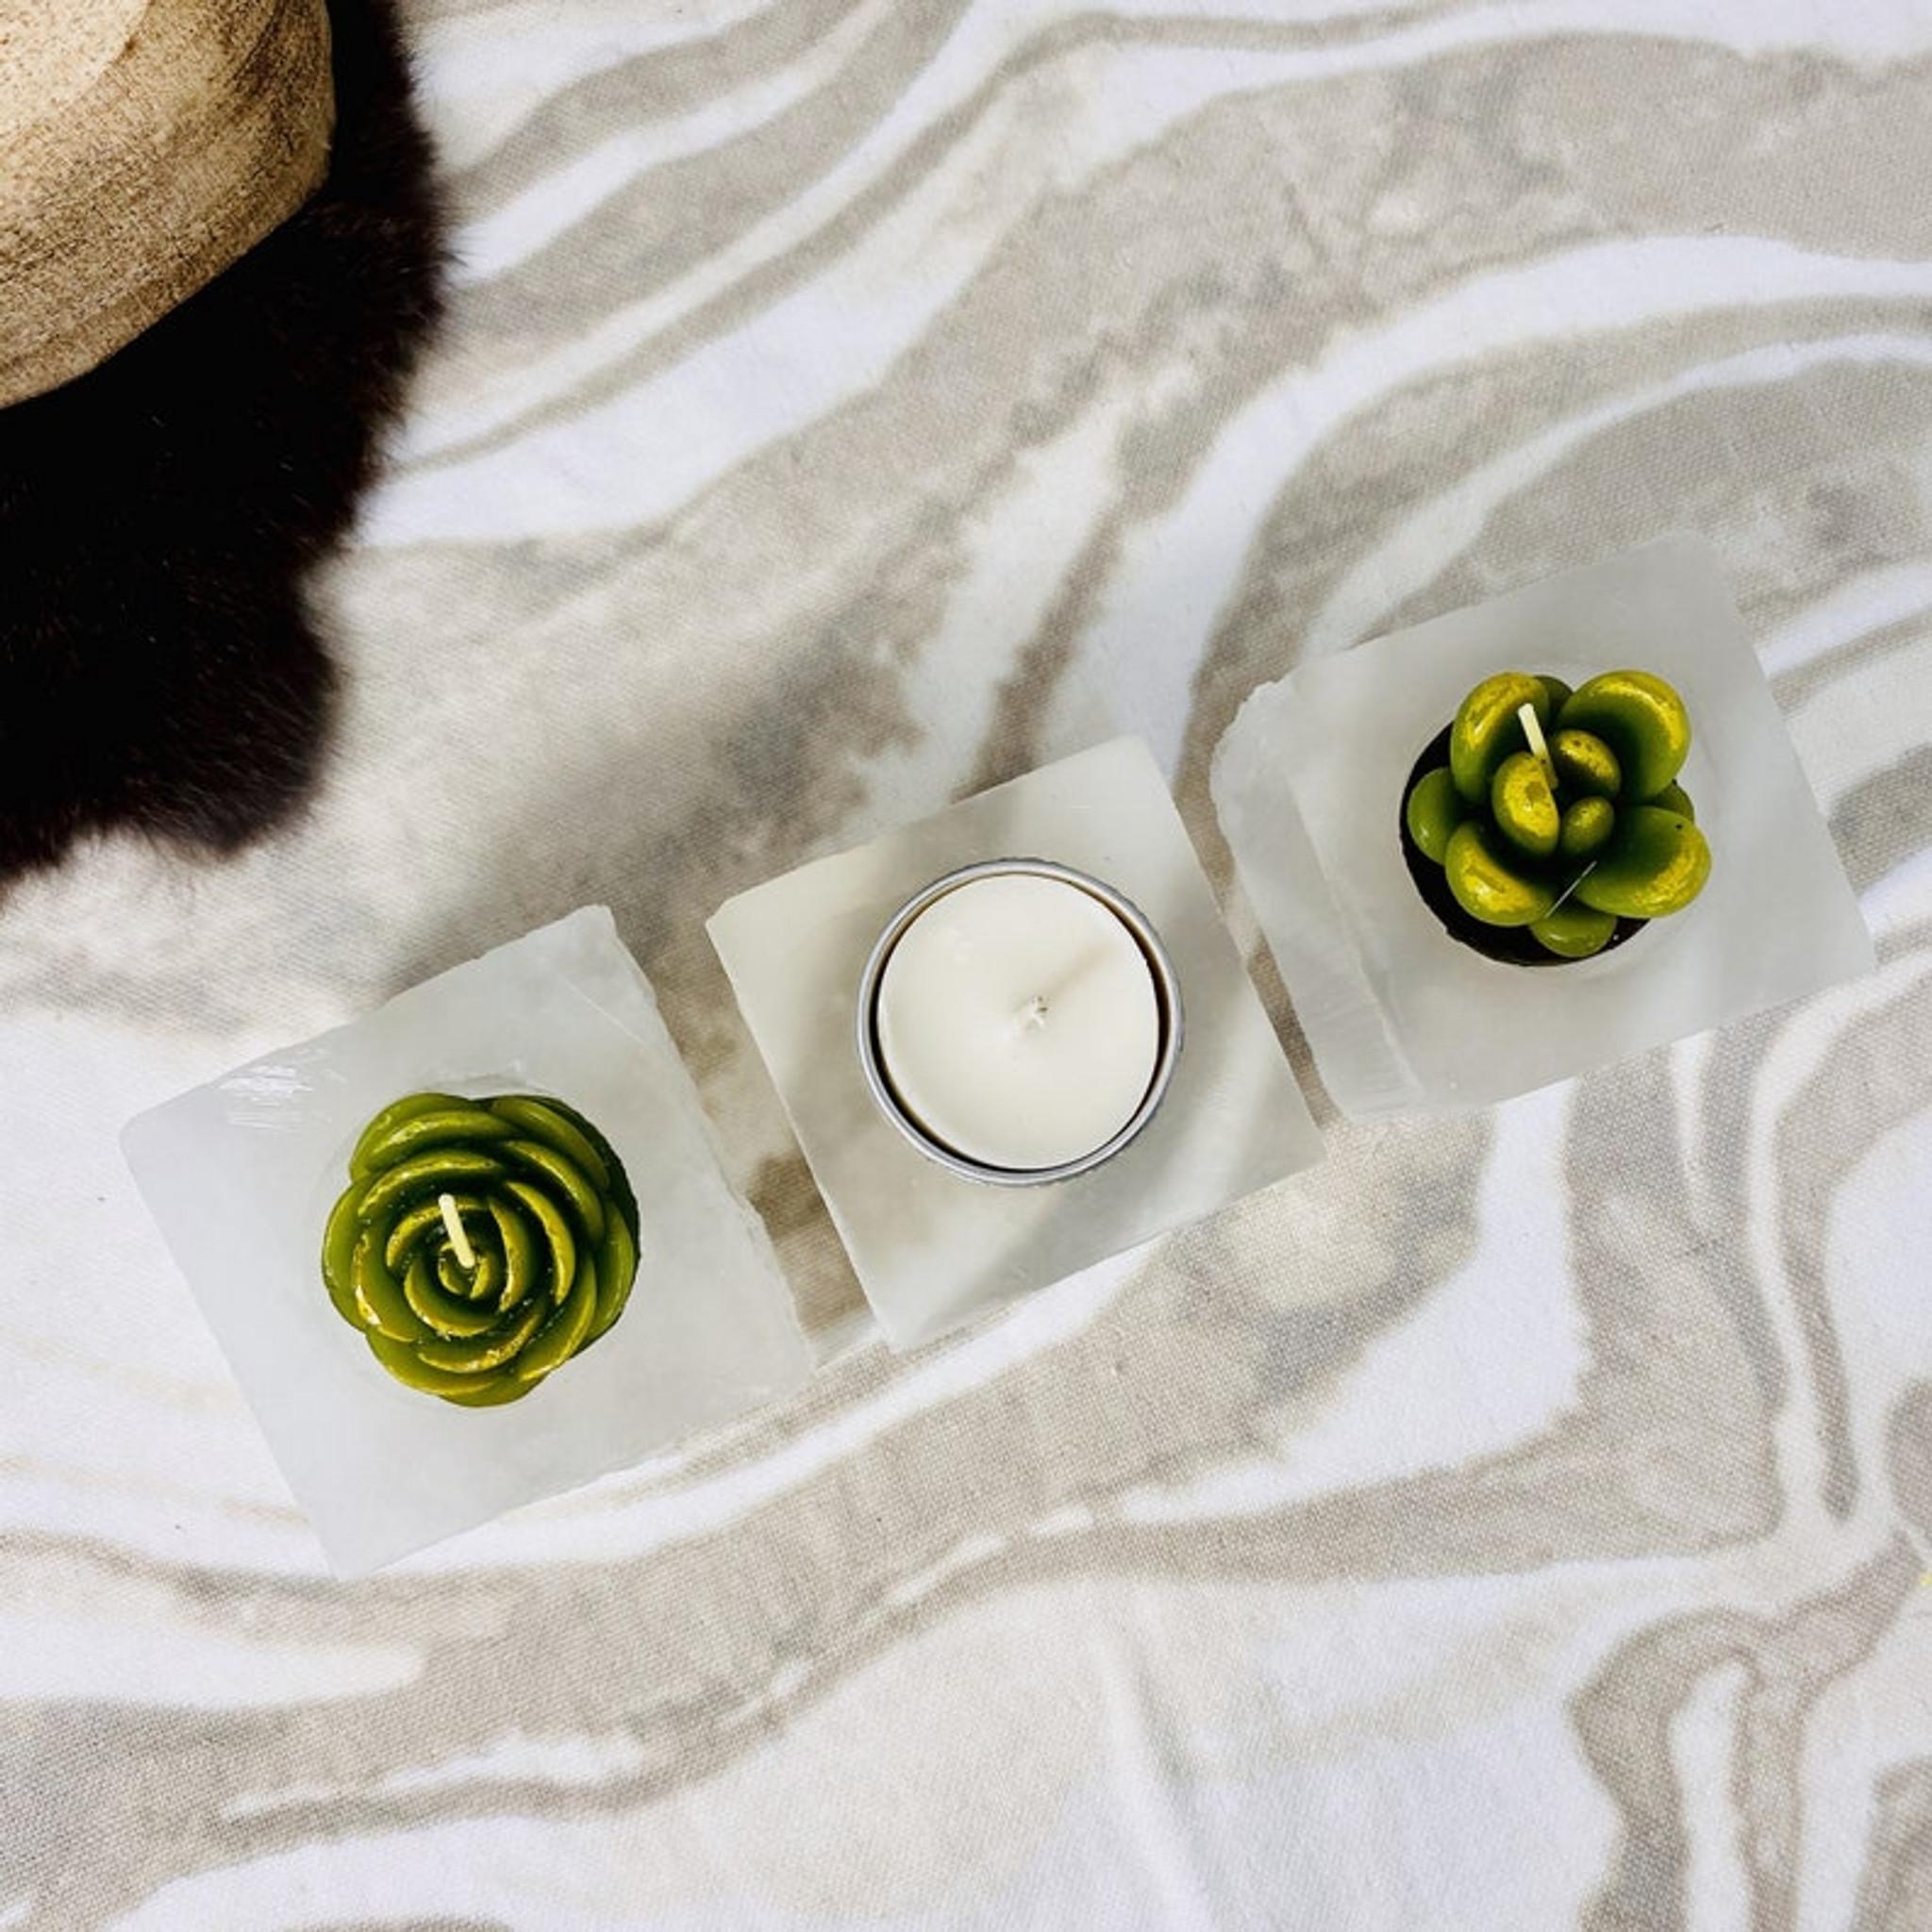 Set of 4 Square Selenite White Crystal Votive Candleholders